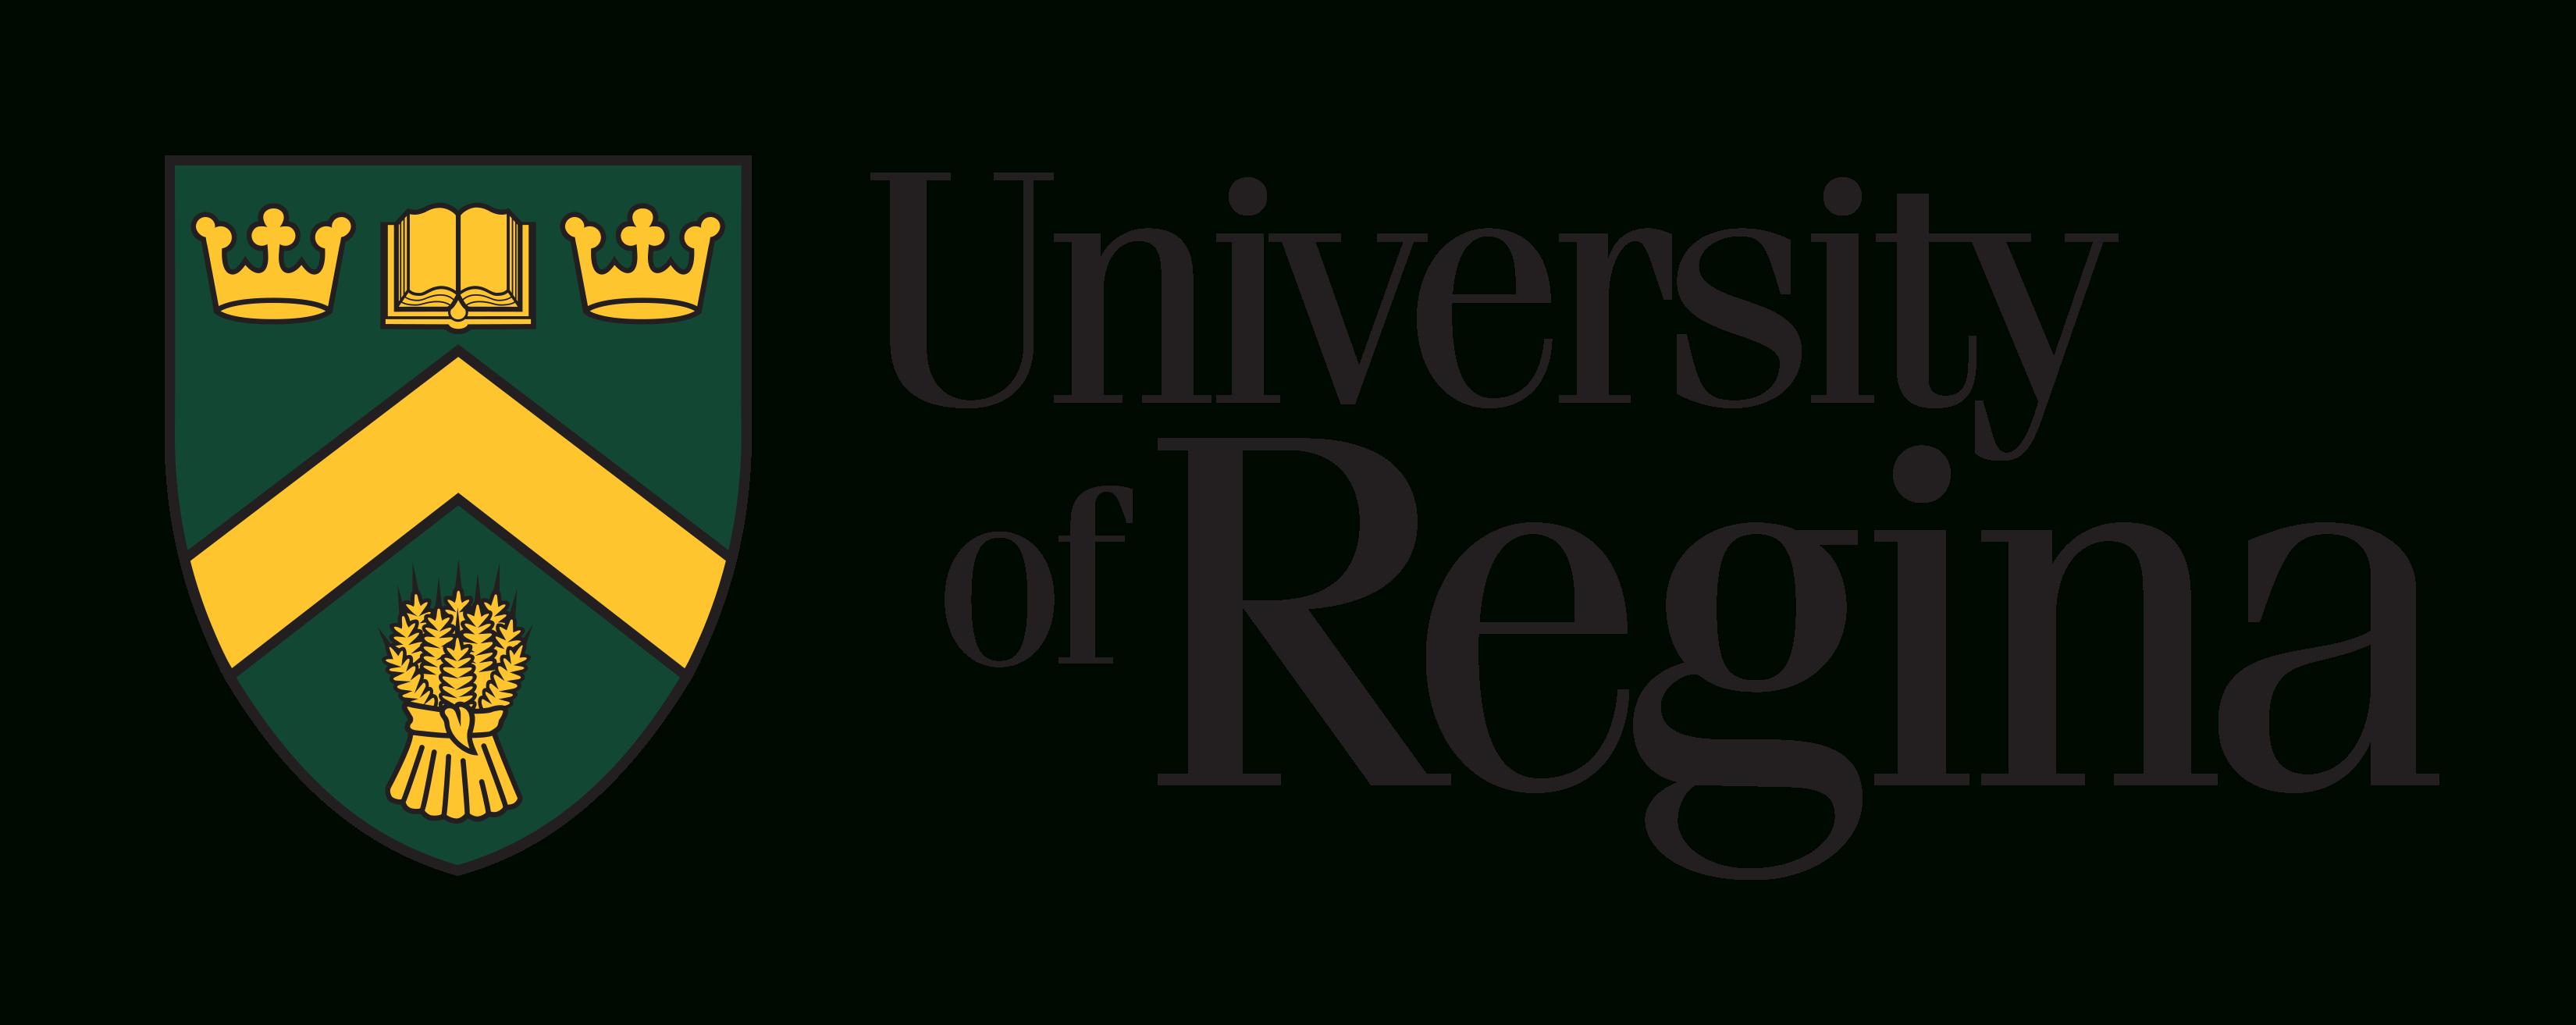 University Of Regina - Wikipedia